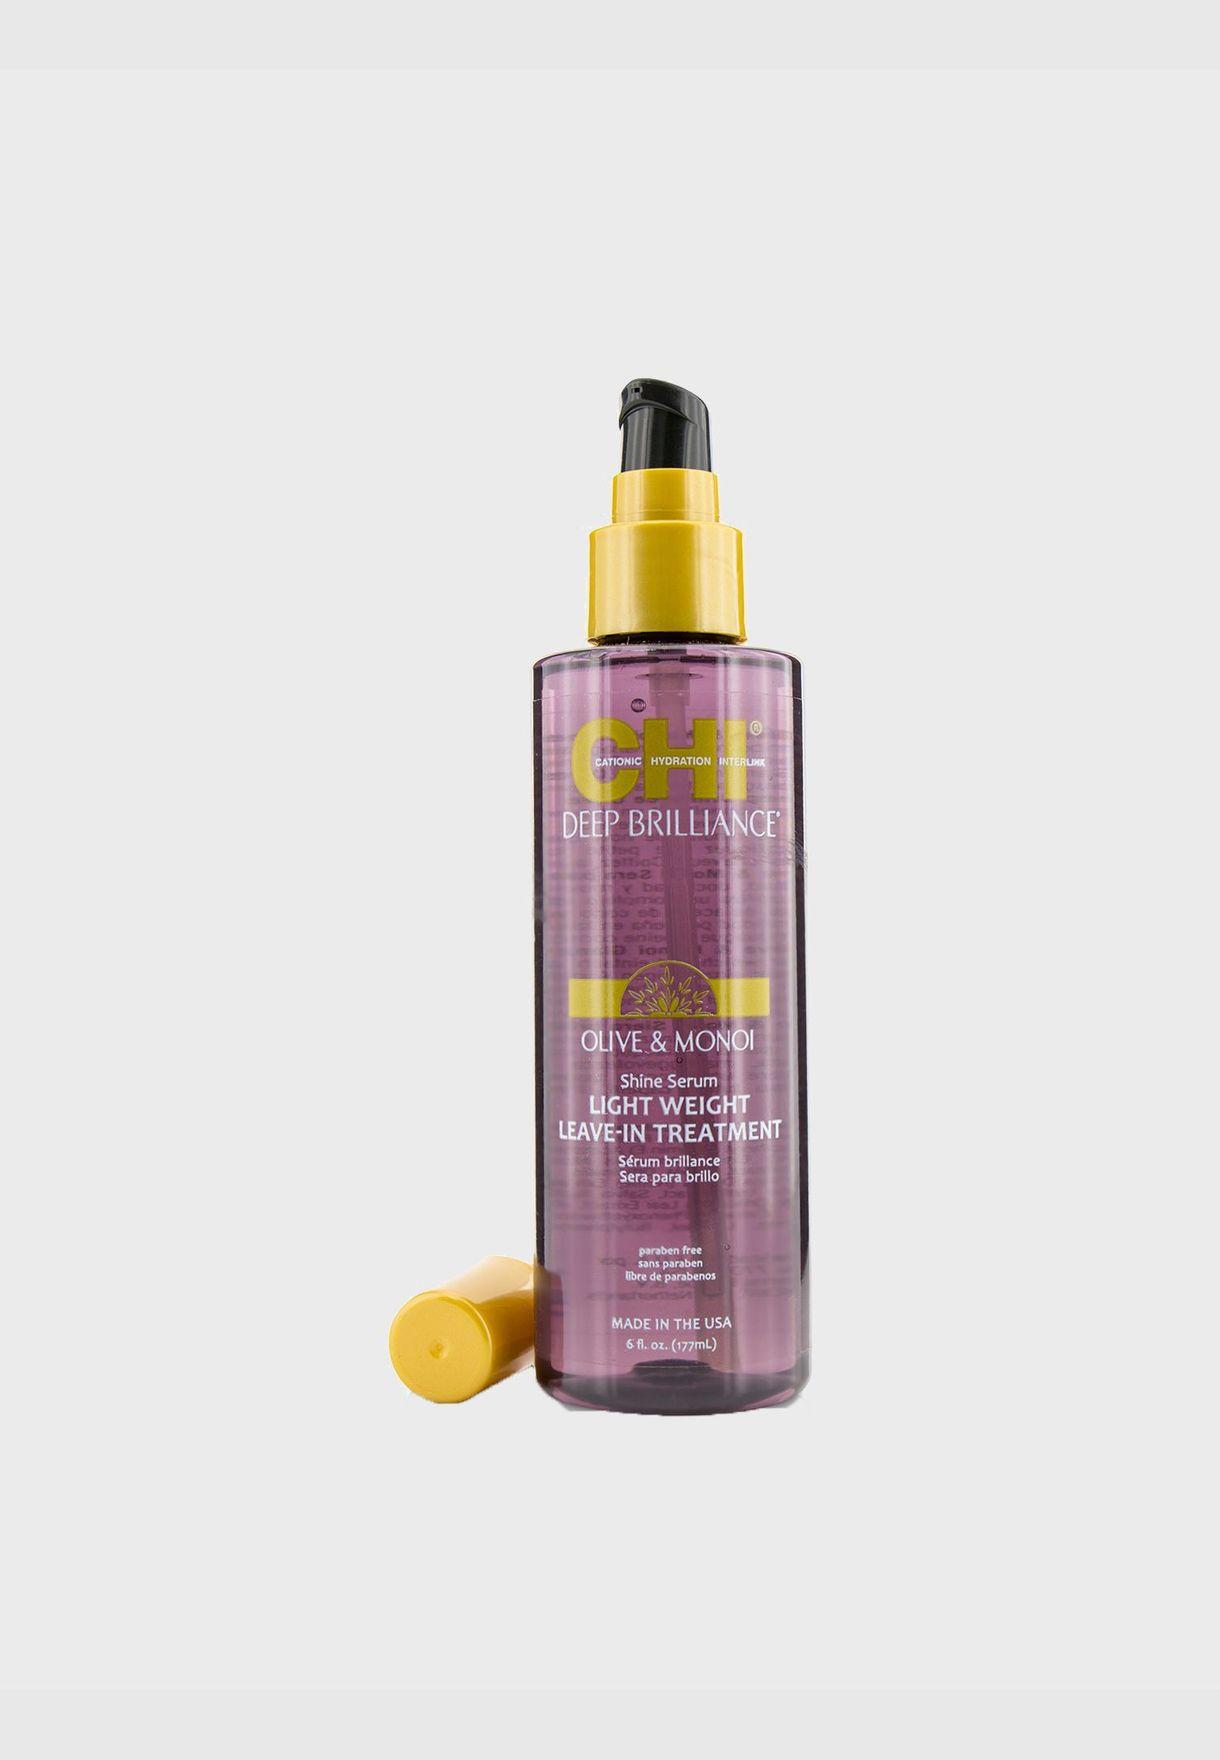 Deep Brilliance Olive & Monoi Shine Serum Light Weight Leave-In Treatment